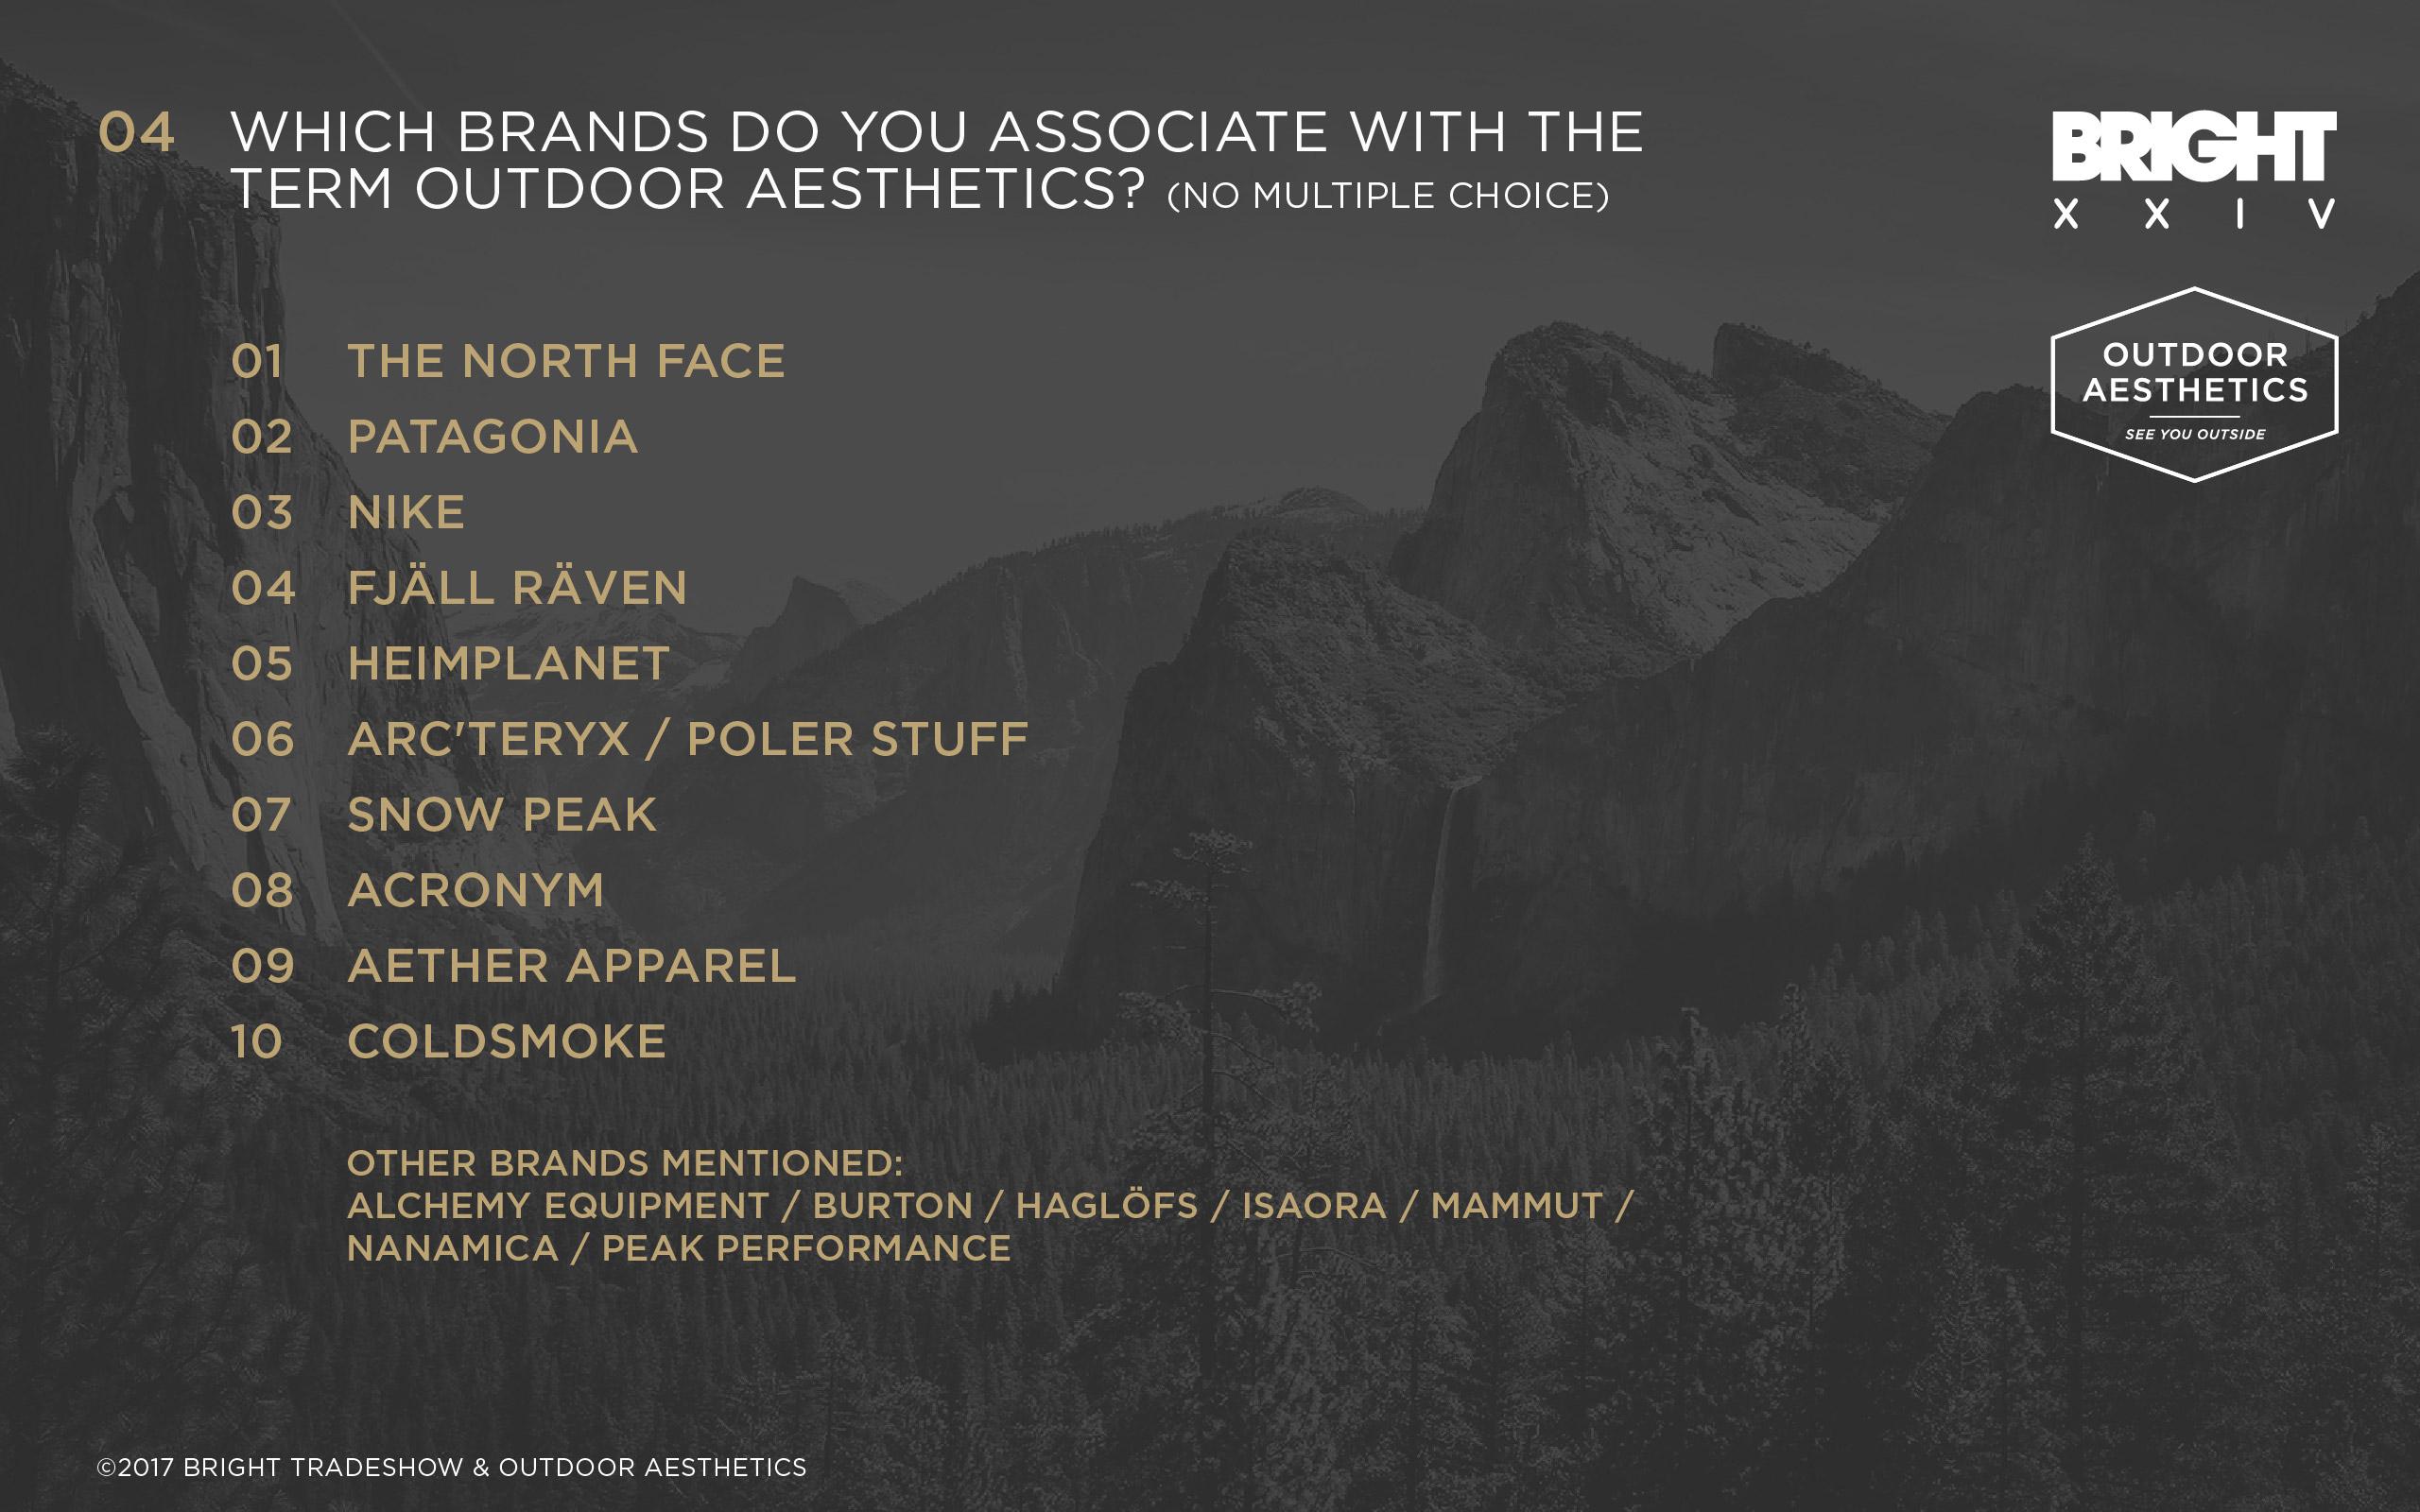 outdoor-aesthetics-trend-survey-2017-05